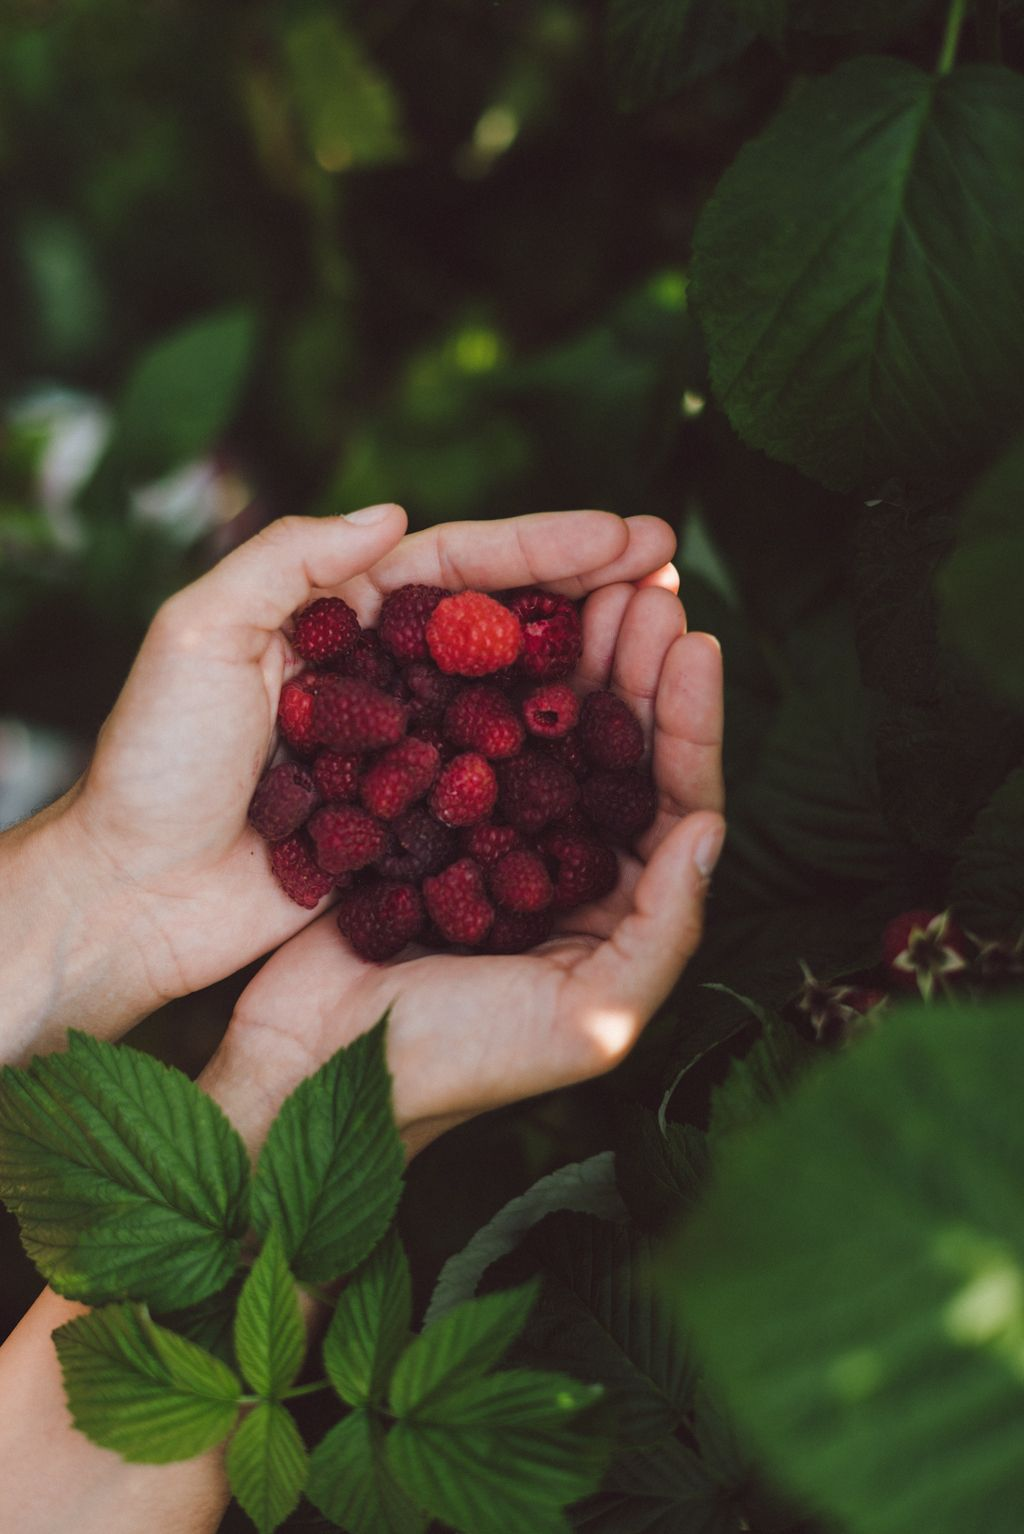 Raspberry picking by Babes in Boyland | เก็บ | Pinterest | Raspberry ... for Fruit Farm Photography  568zmd